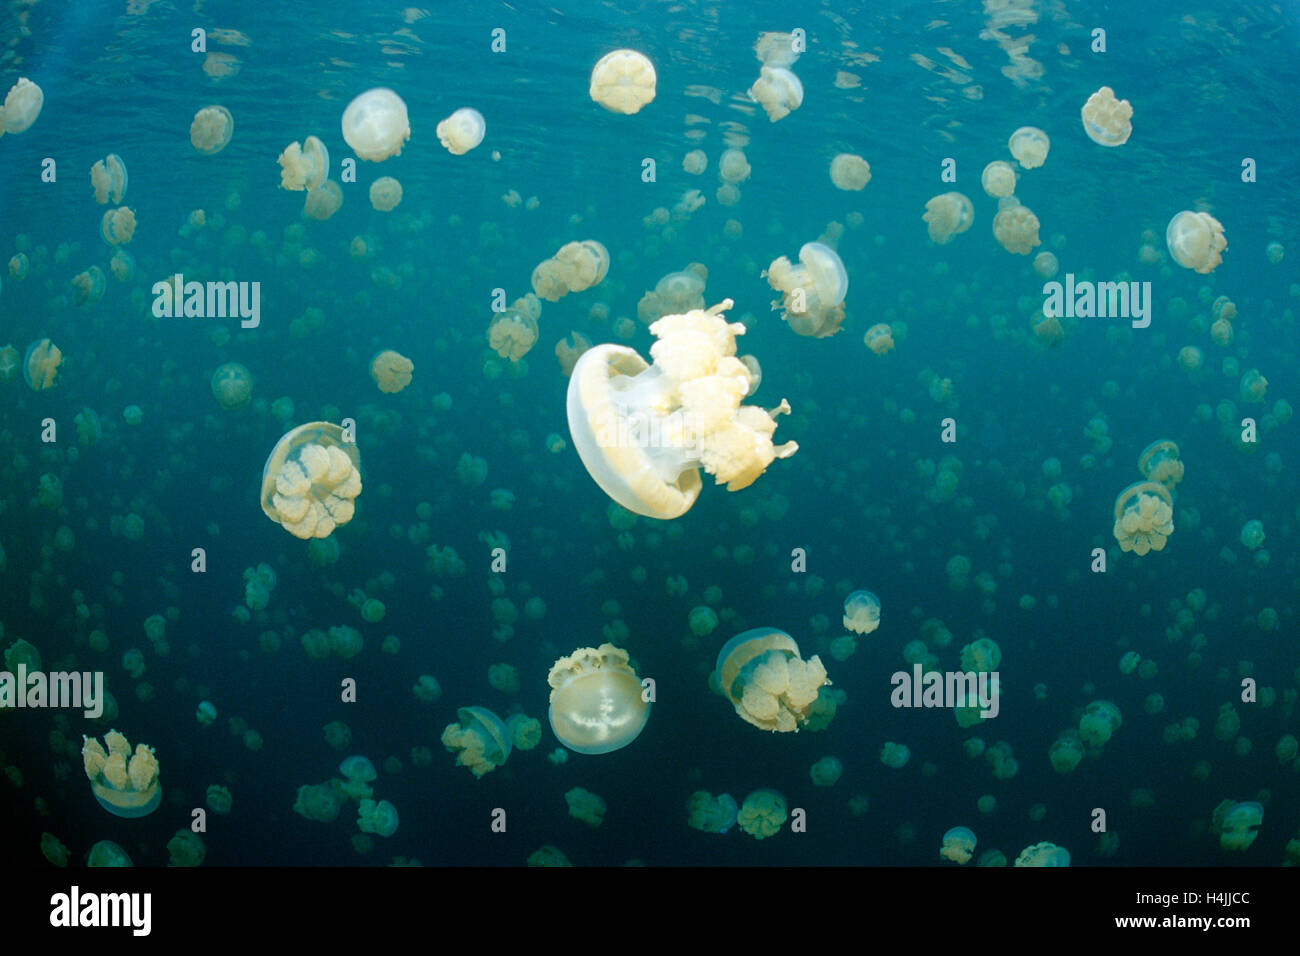 Jellyfish Lake with endemic stingless Spotted Jelly or Lagoon Jelly (Mastigias papua etpisonii), Palau, Micronesia, - Stock Image